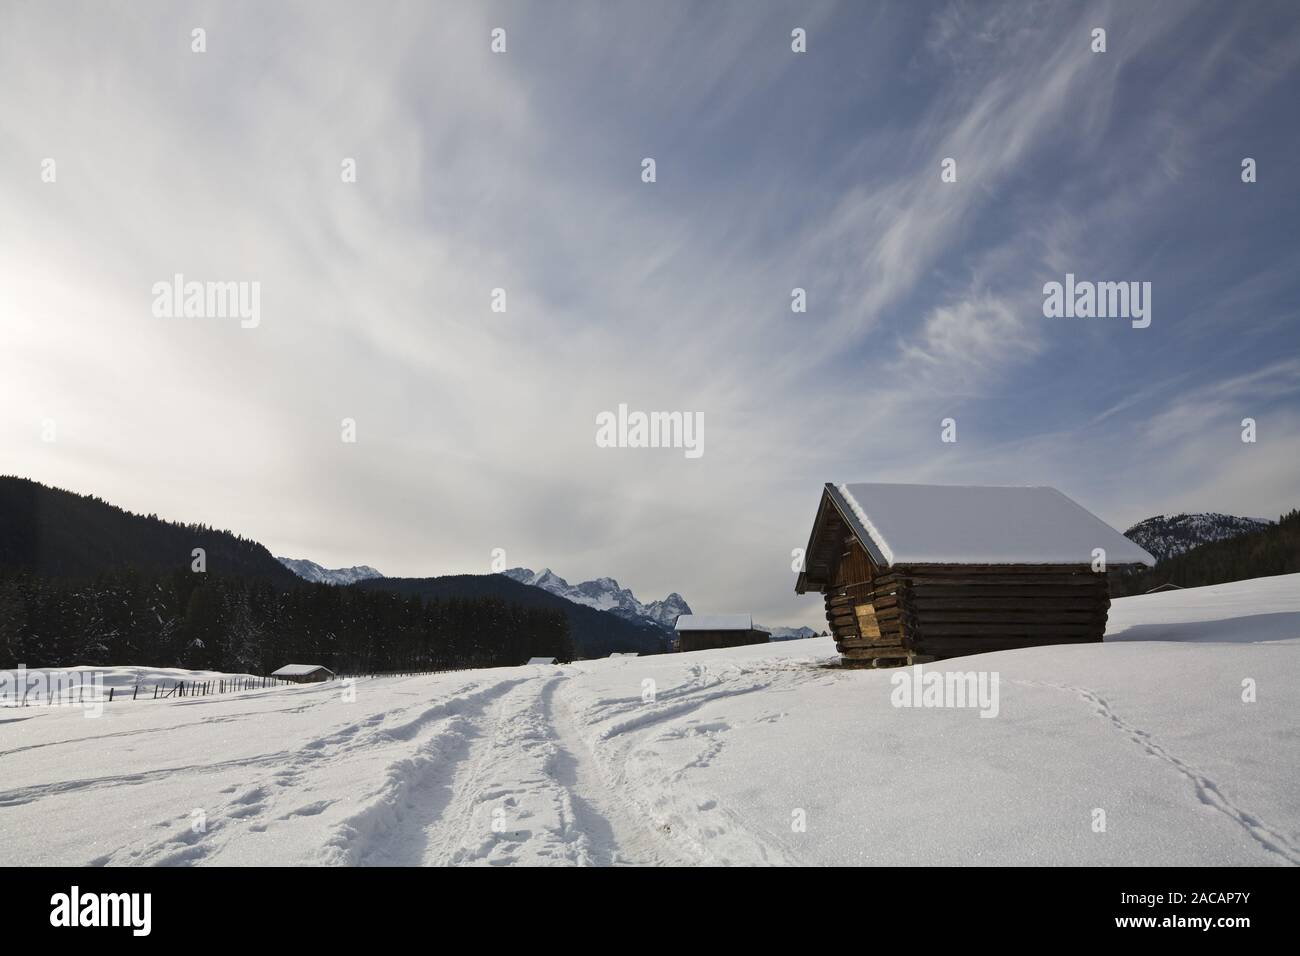 Boatshouse am Kochelsee mit Nebel, Oberbayern Stockfoto